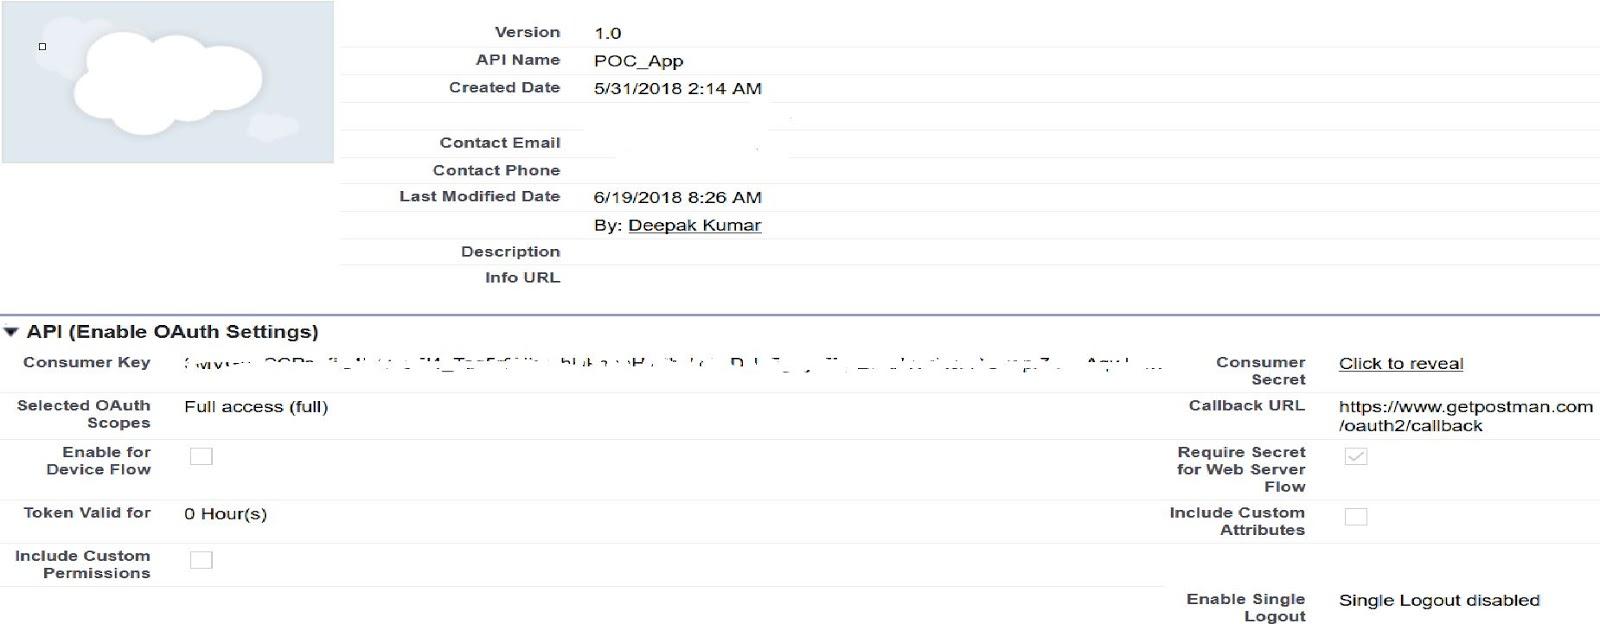 salesforce hands-on: Chrome postman for Rest API testing using